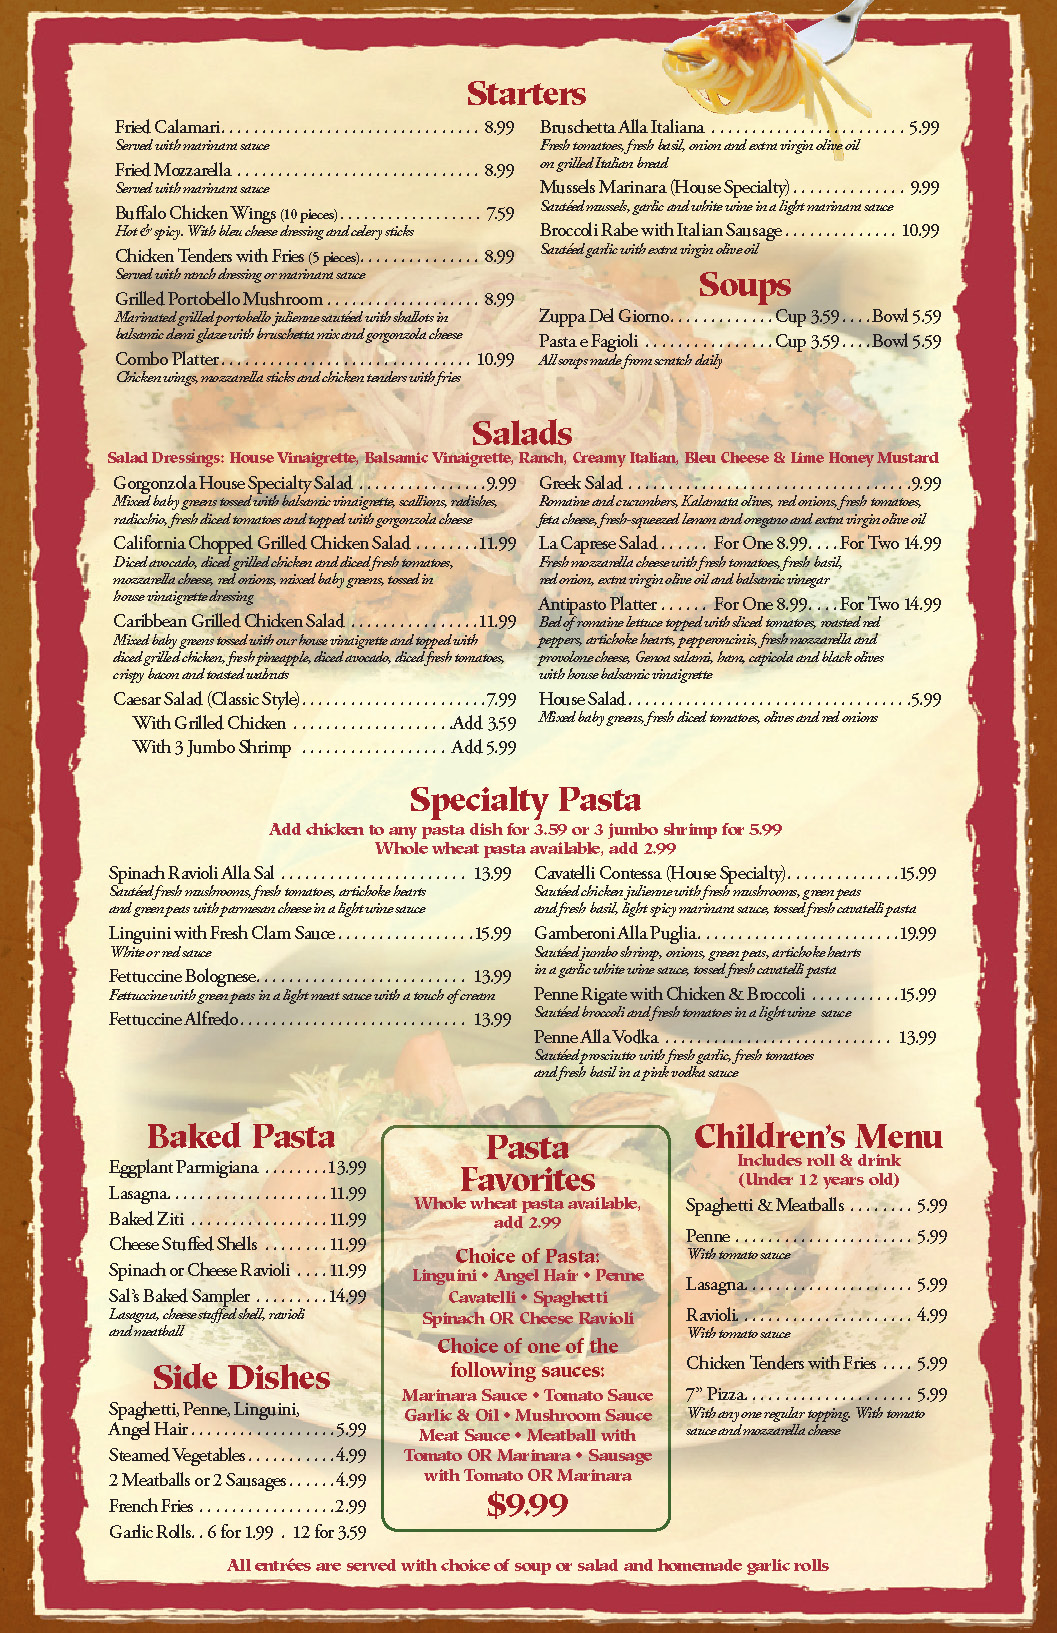 Free Menu Templates Word restaurant excel pdf christmas – Free Menu Templates for Word